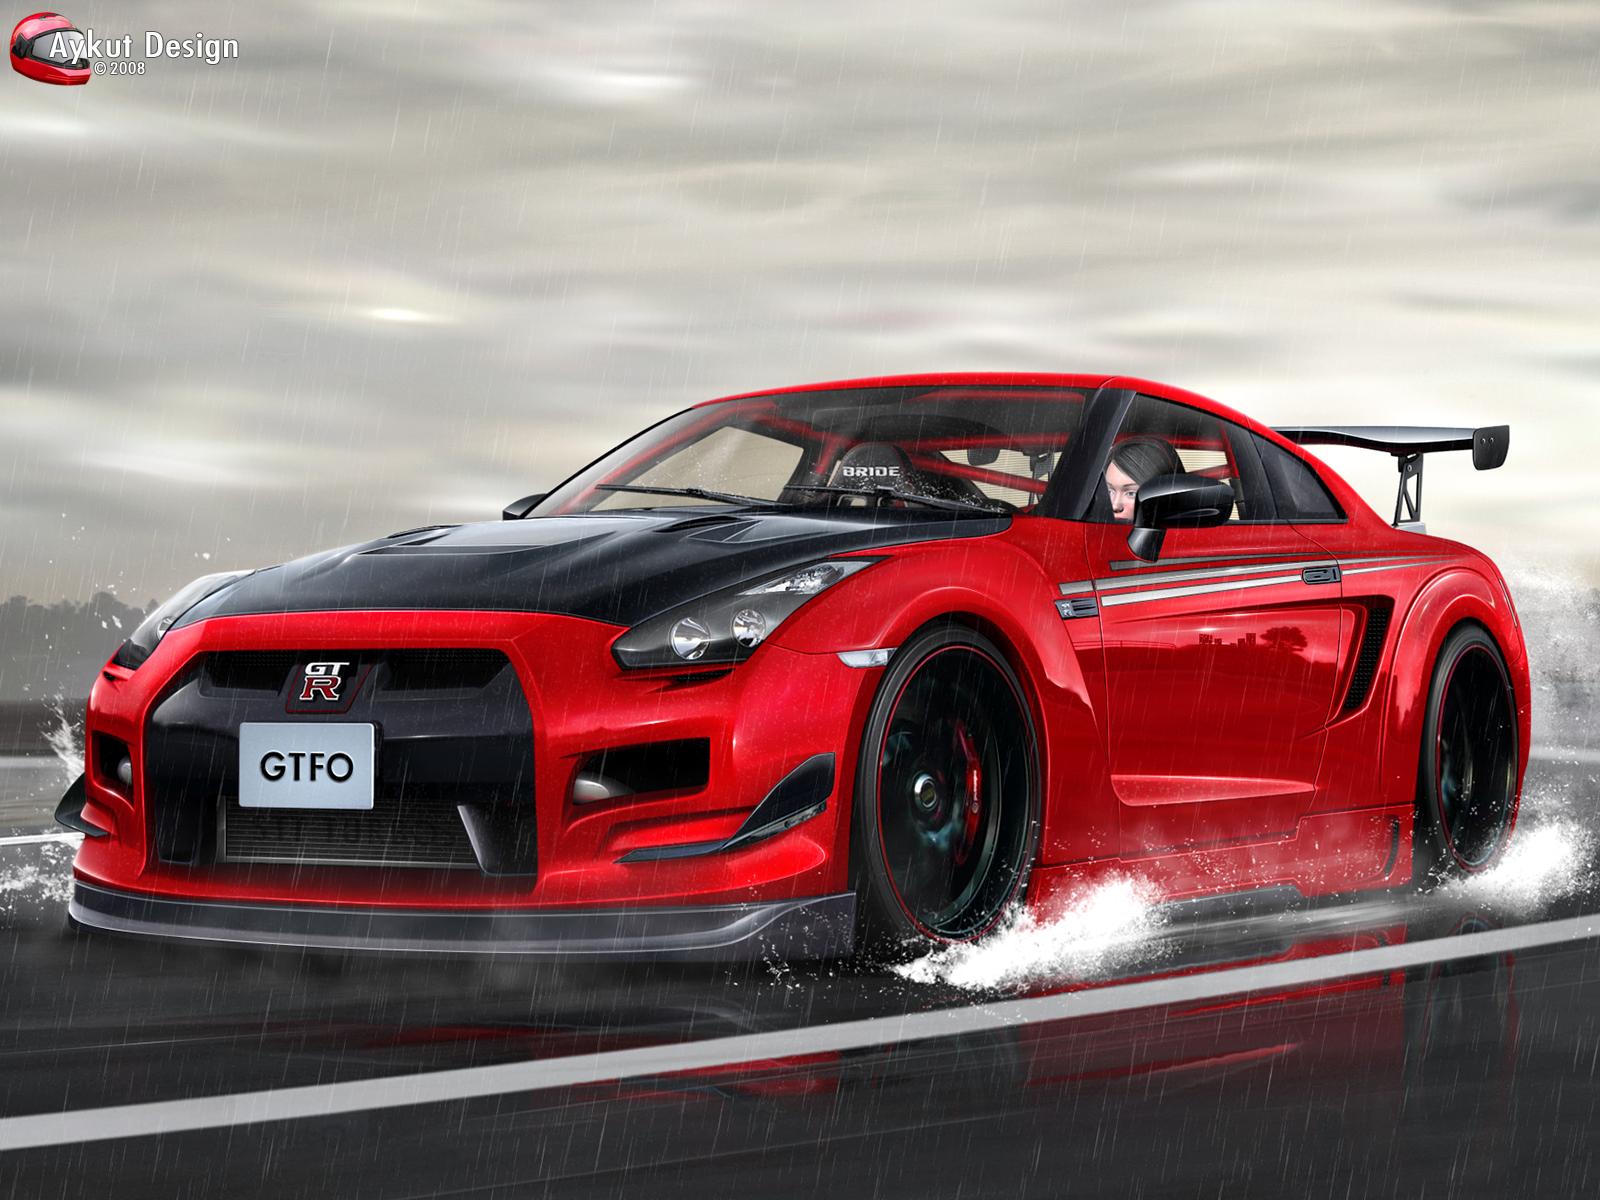 Nissan GT-R R35 Photo